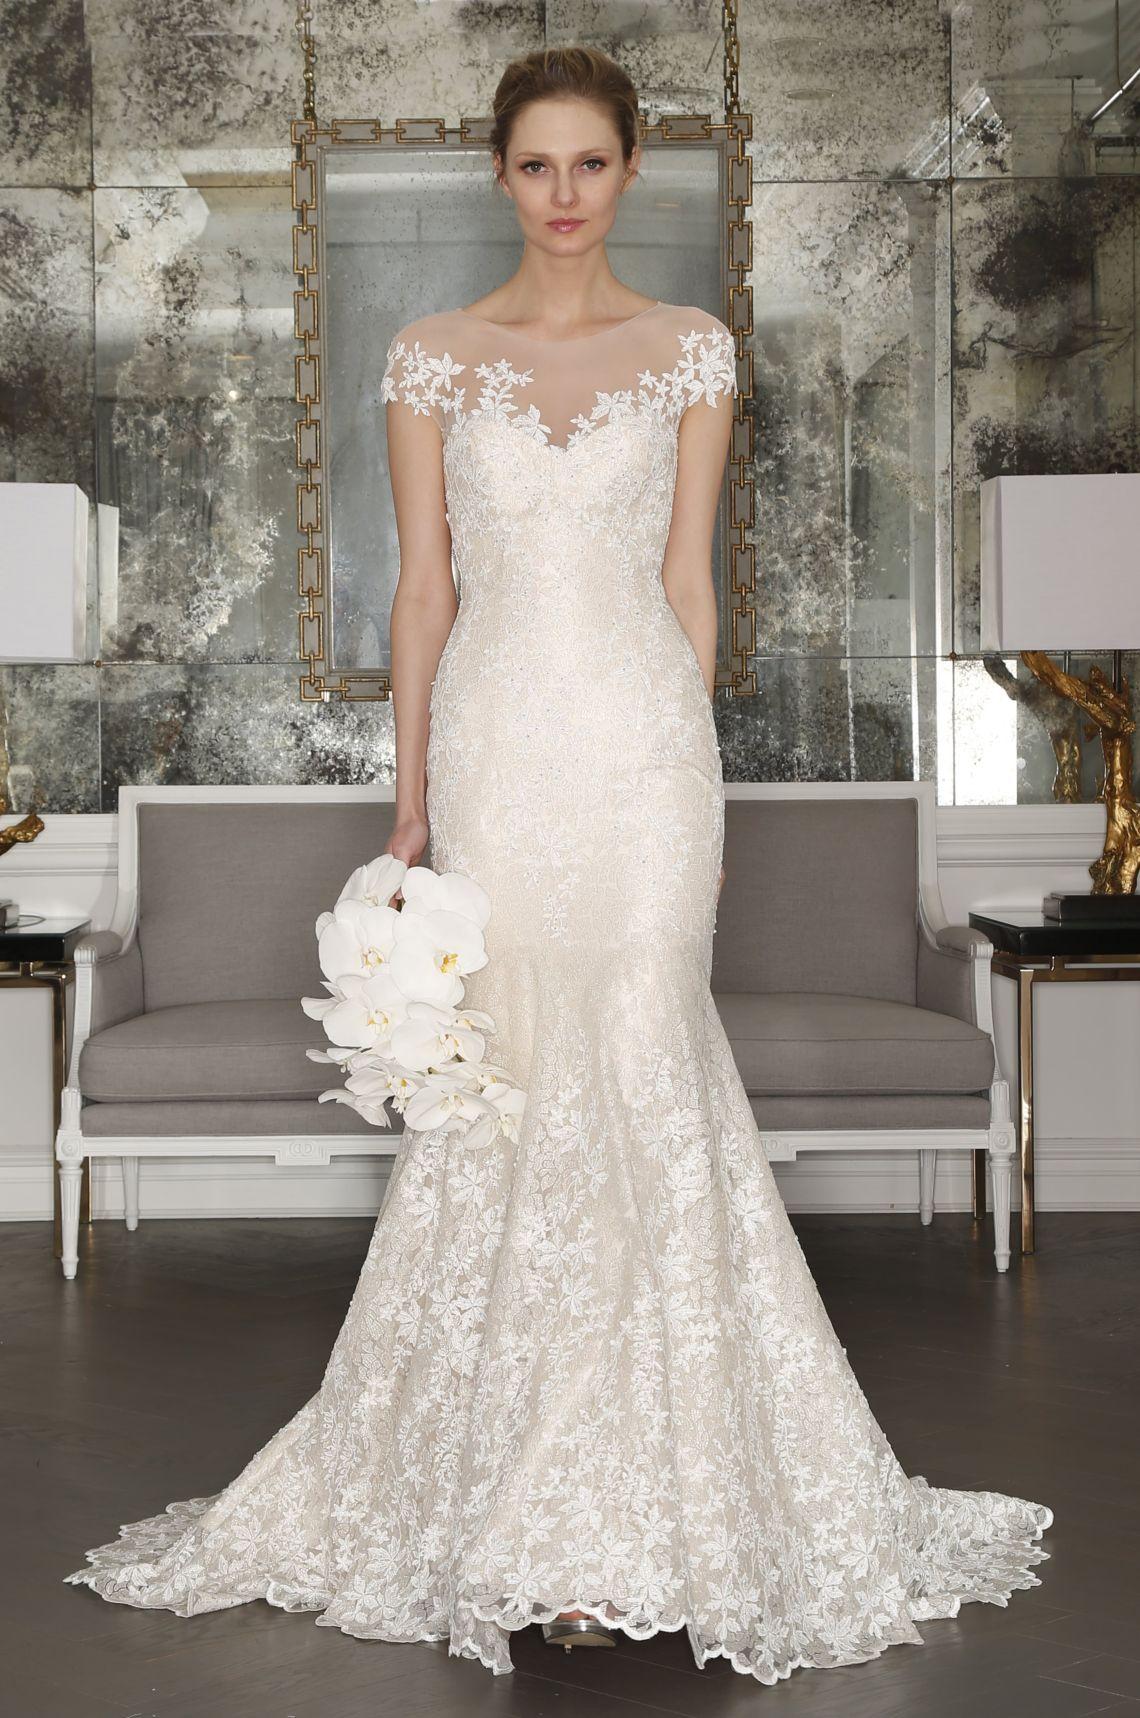 Romona Keveza Collection Bridal 2017 - Rustic Wedding Chic